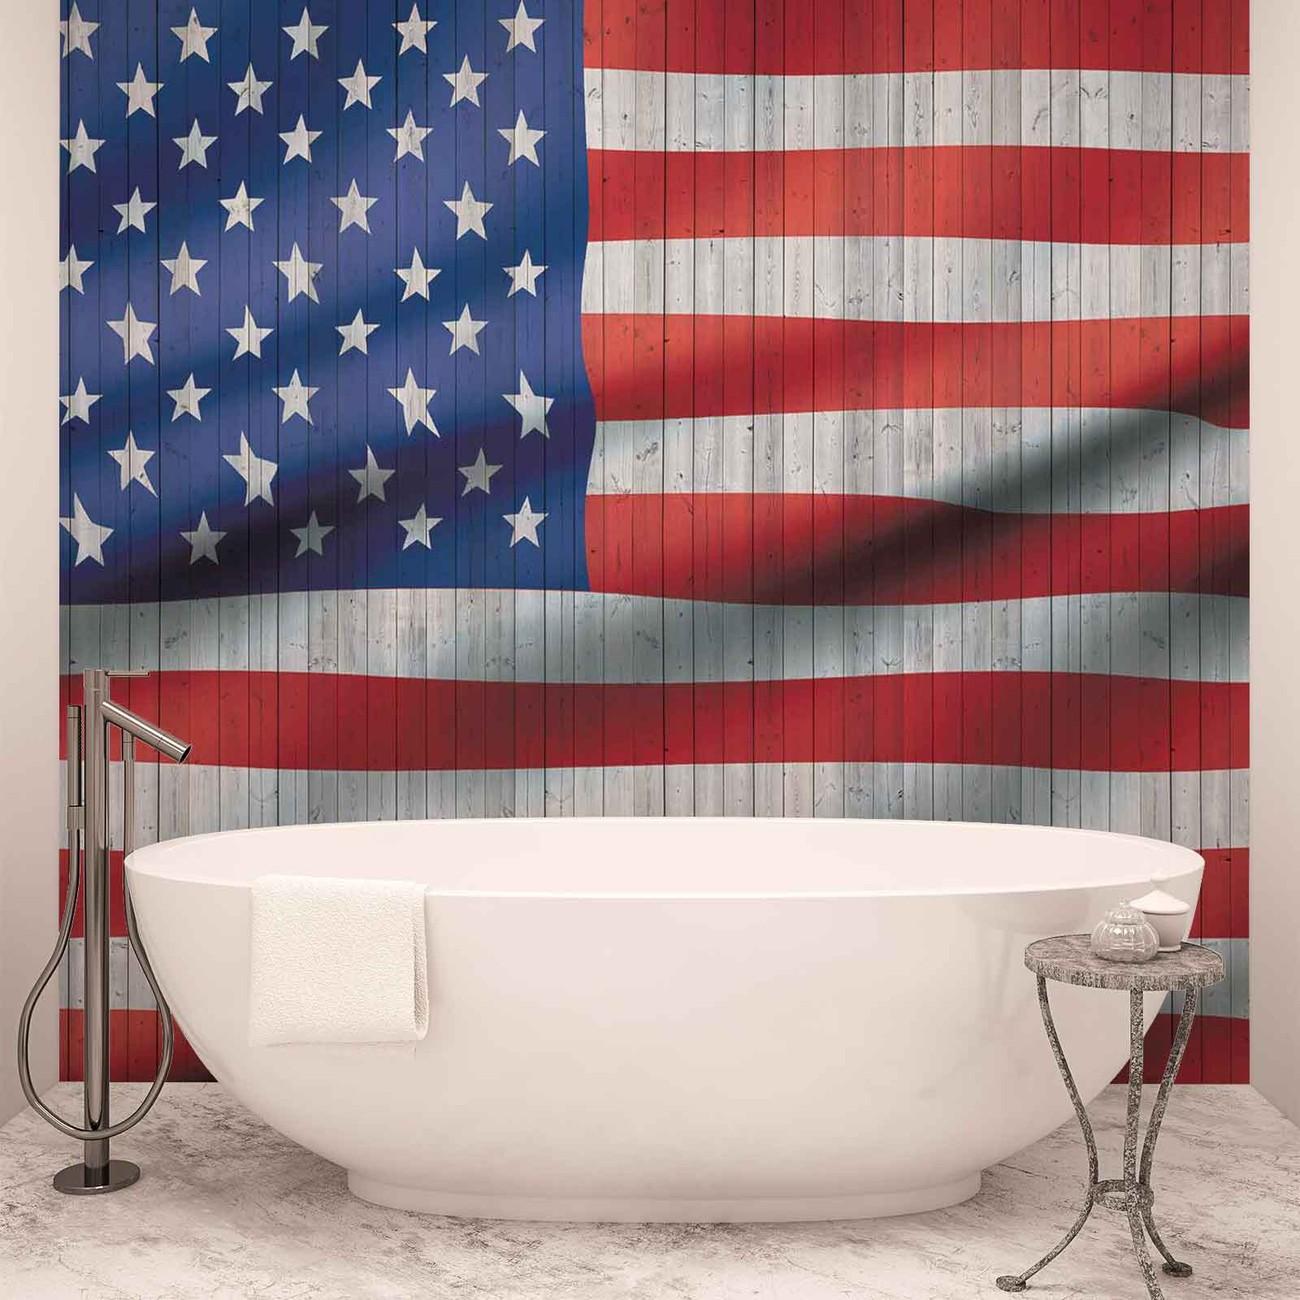 Usa american flag wall paper mural buy at europosters for American flag wall mural